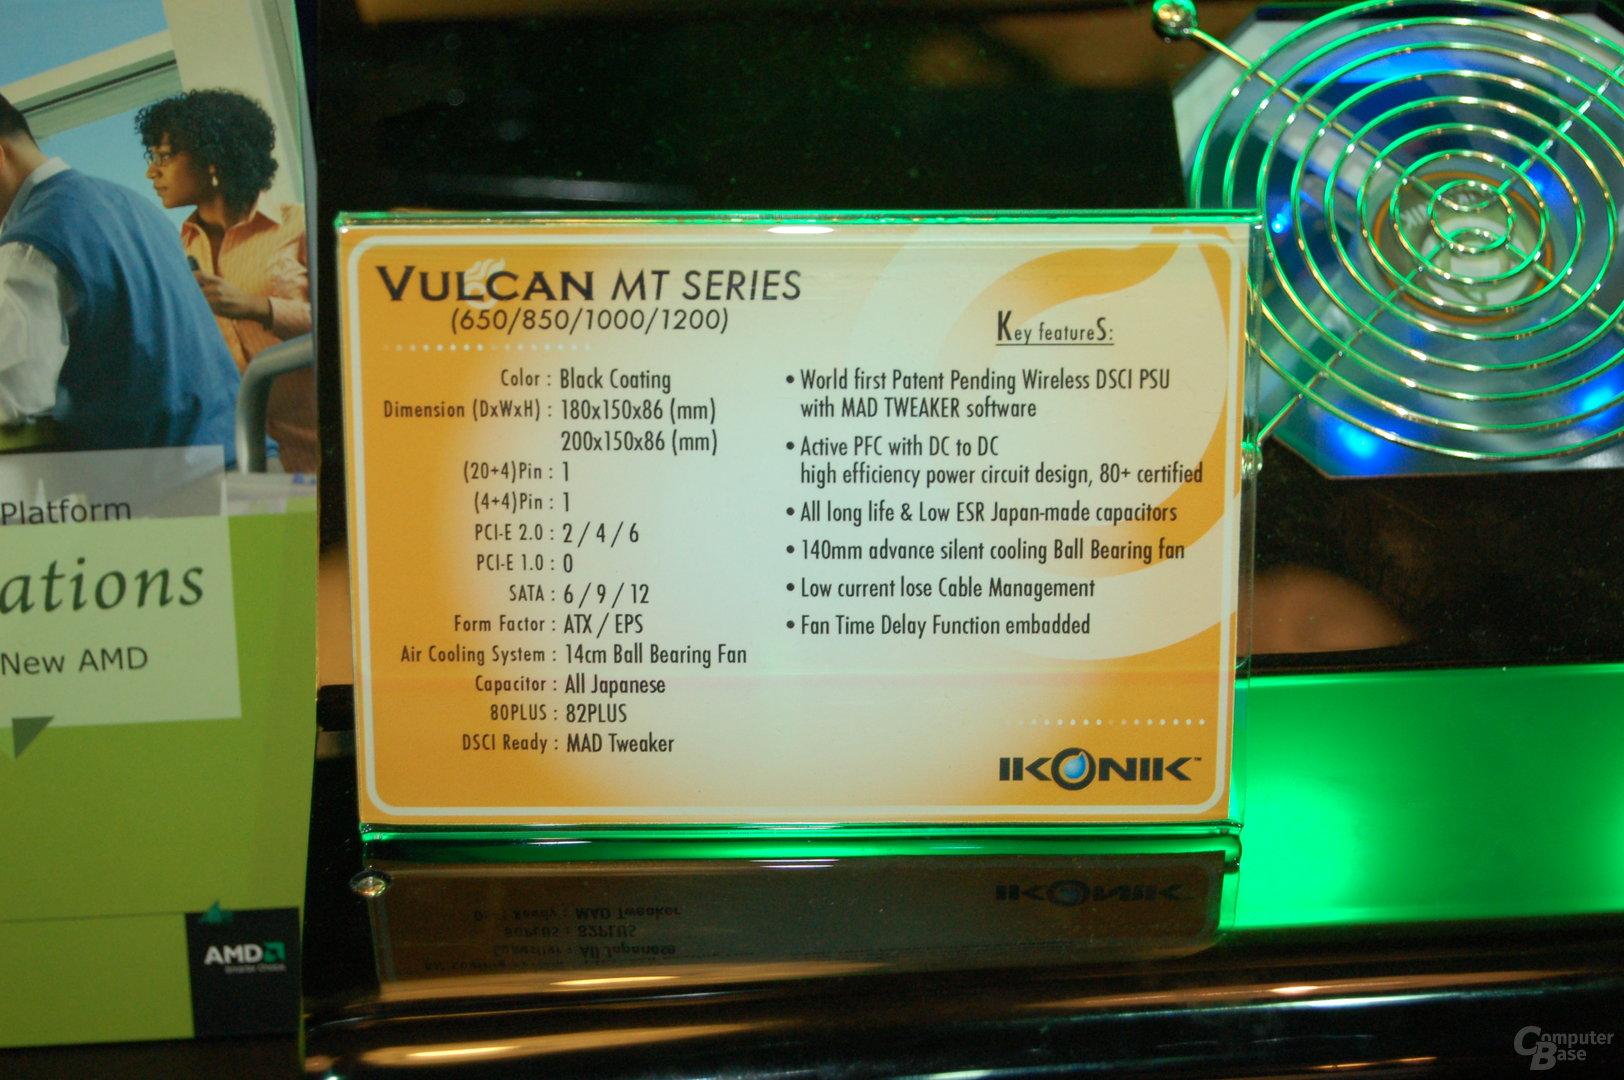 Vulcan MT Series